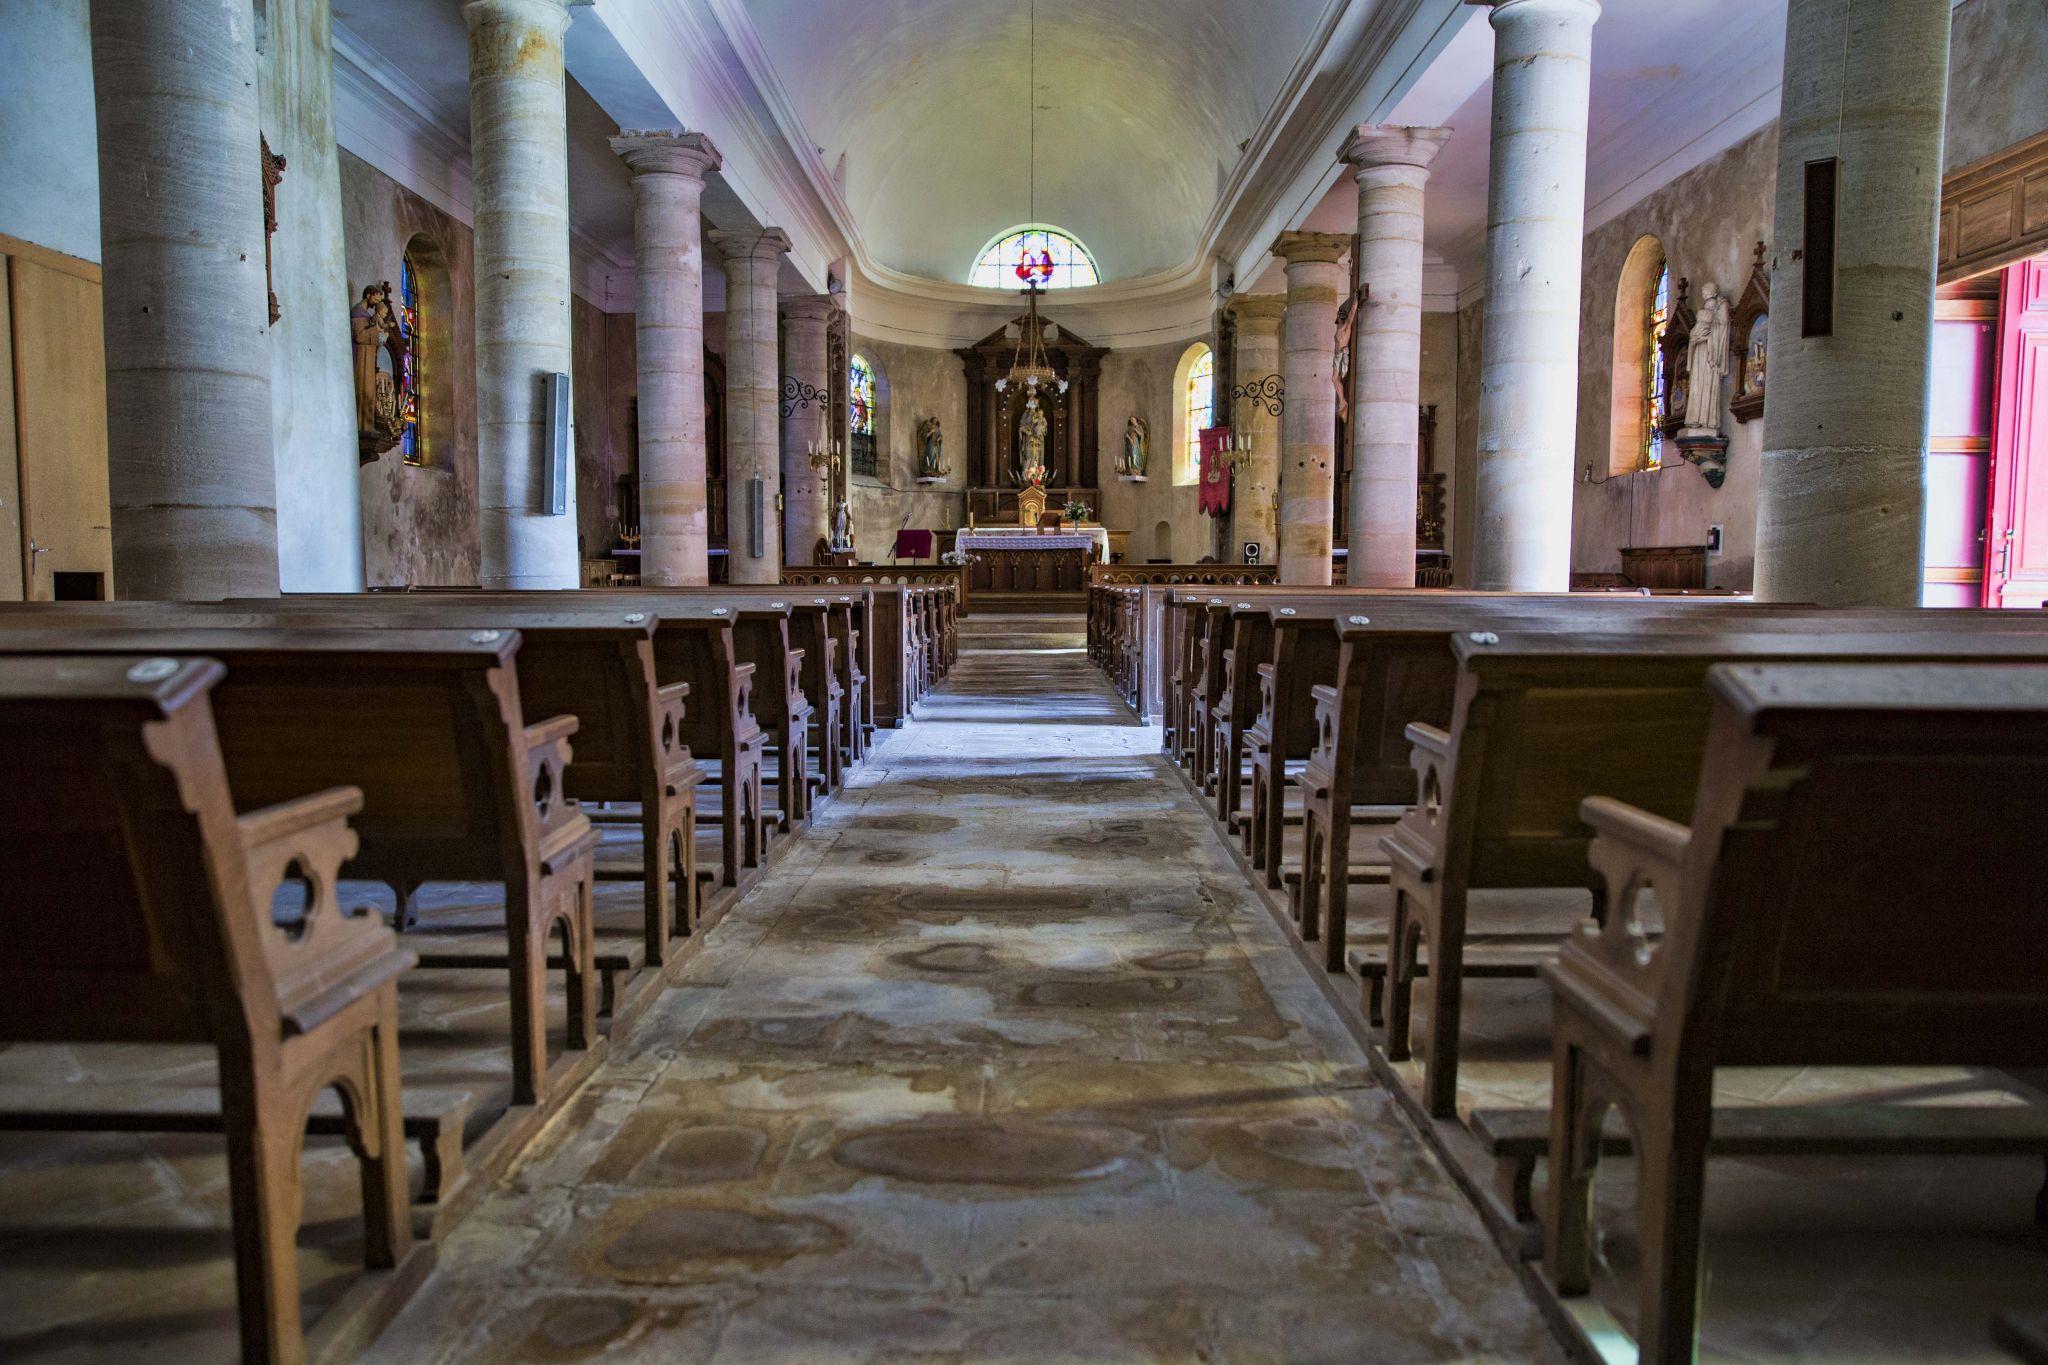 Church in Consenvoye, France